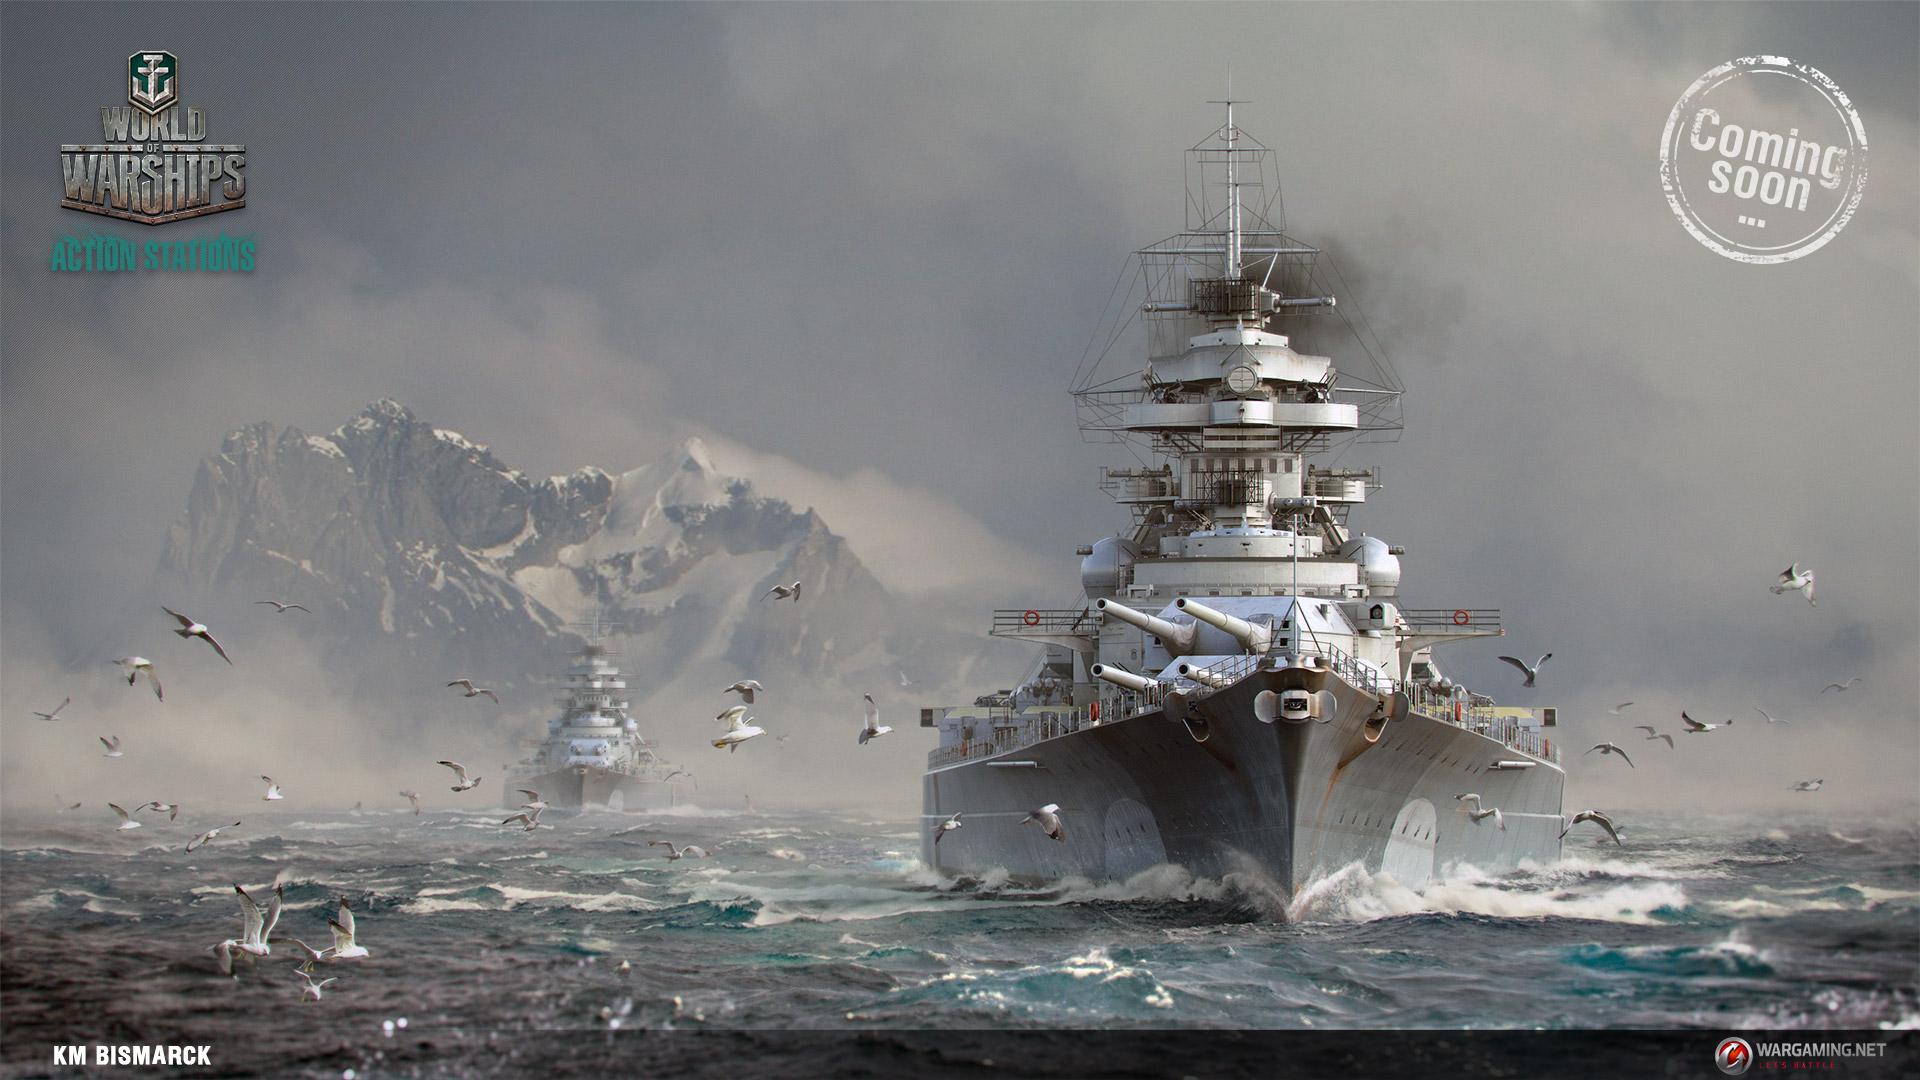 World Of Warships Wallpaper: World Of Warships